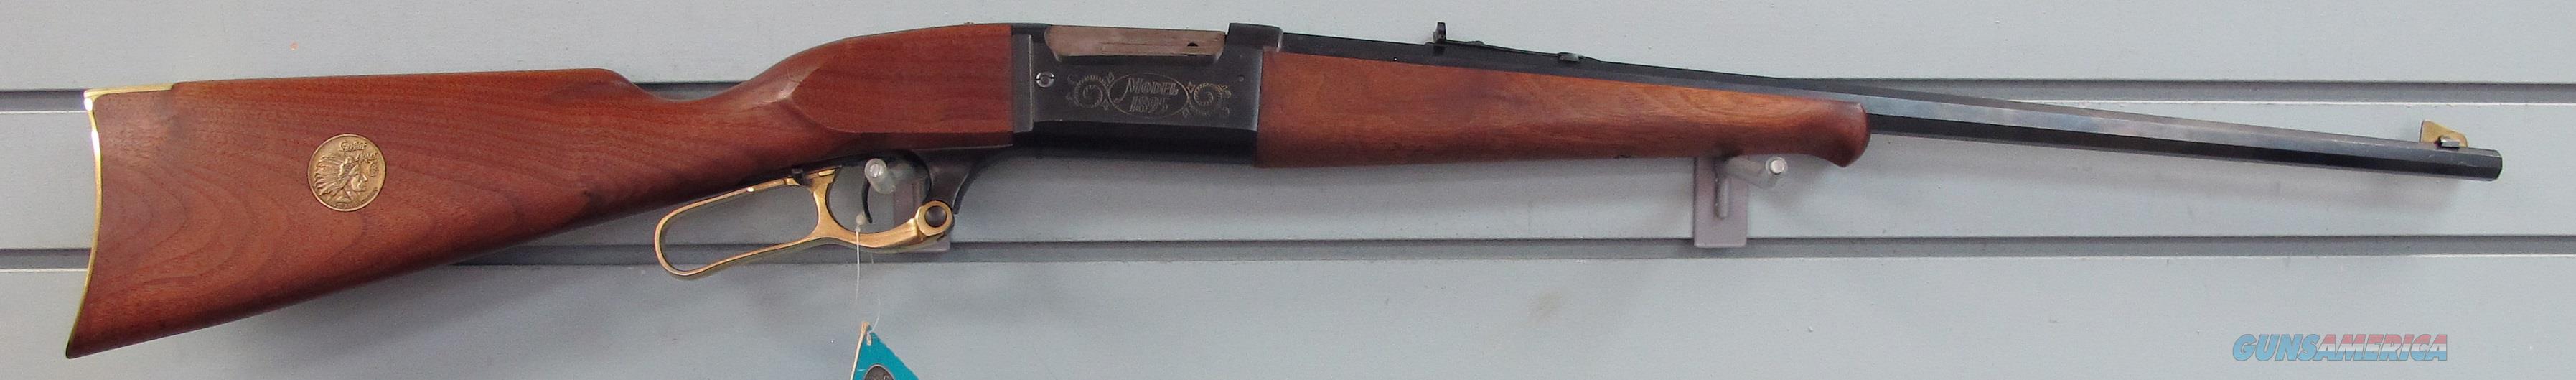 SAVAGE ARMS MODEL 1895 .308  Guns > Rifles > Savage Rifles > Model 95/99 Family